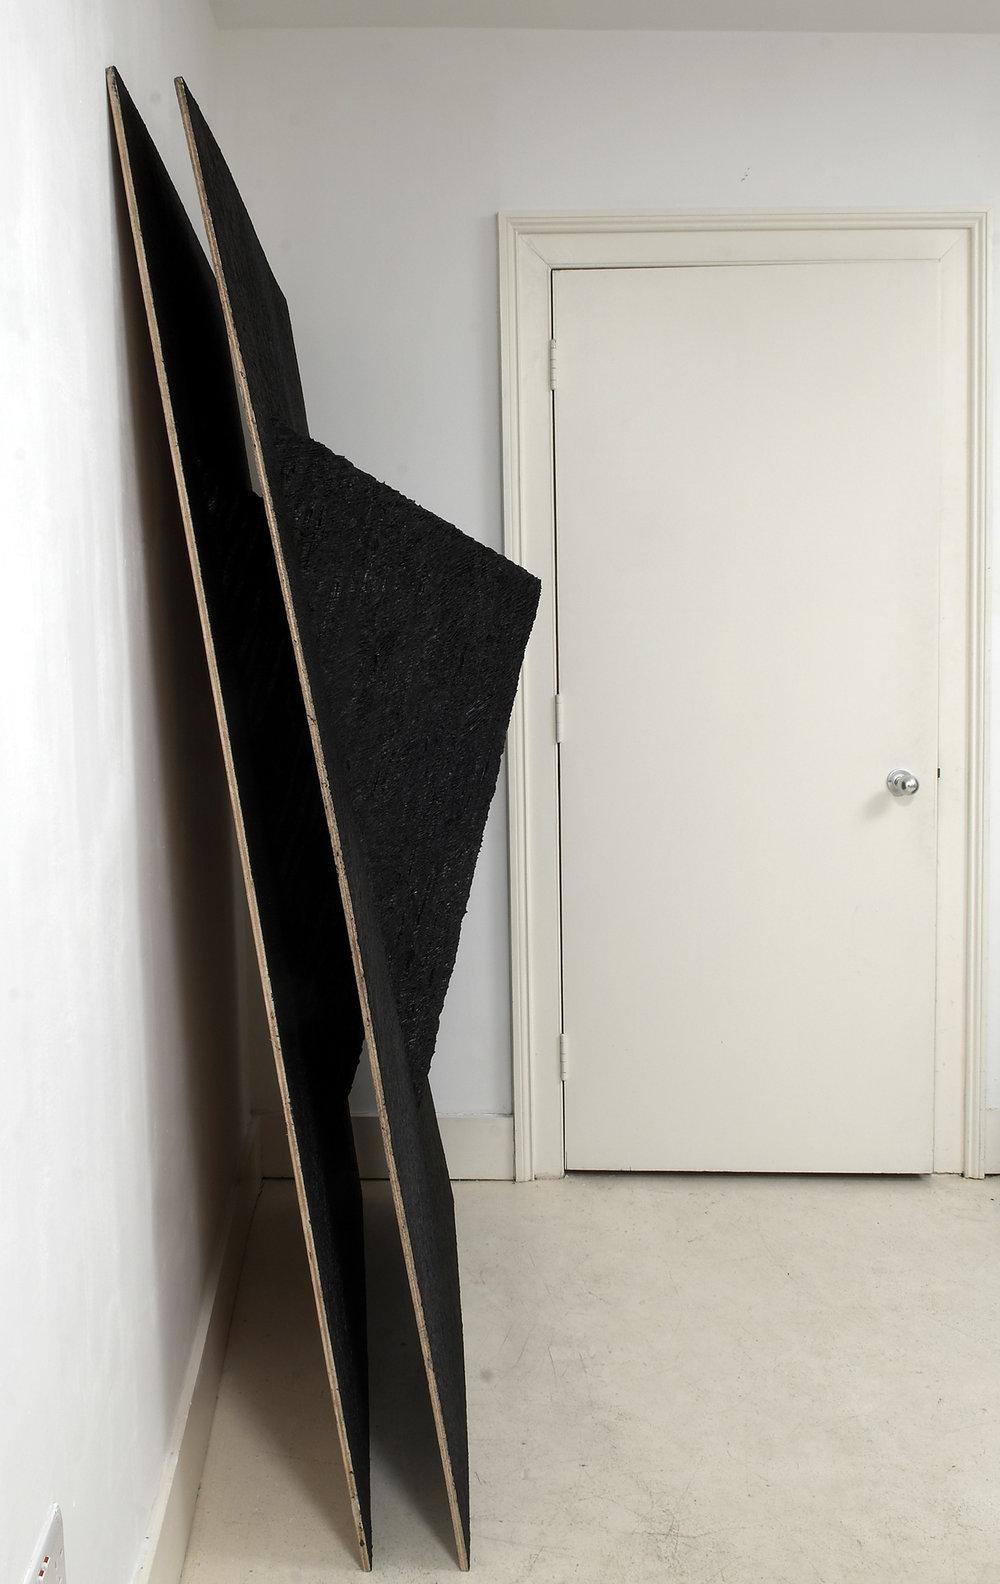 Leaning-Sculpture-&-Leaning-Sculpture-[Replica],-Board,-screws,-paper-maché,-black-board-paint,-acrylic-paint,-gel-medium,-both;-195-view-3.jpg